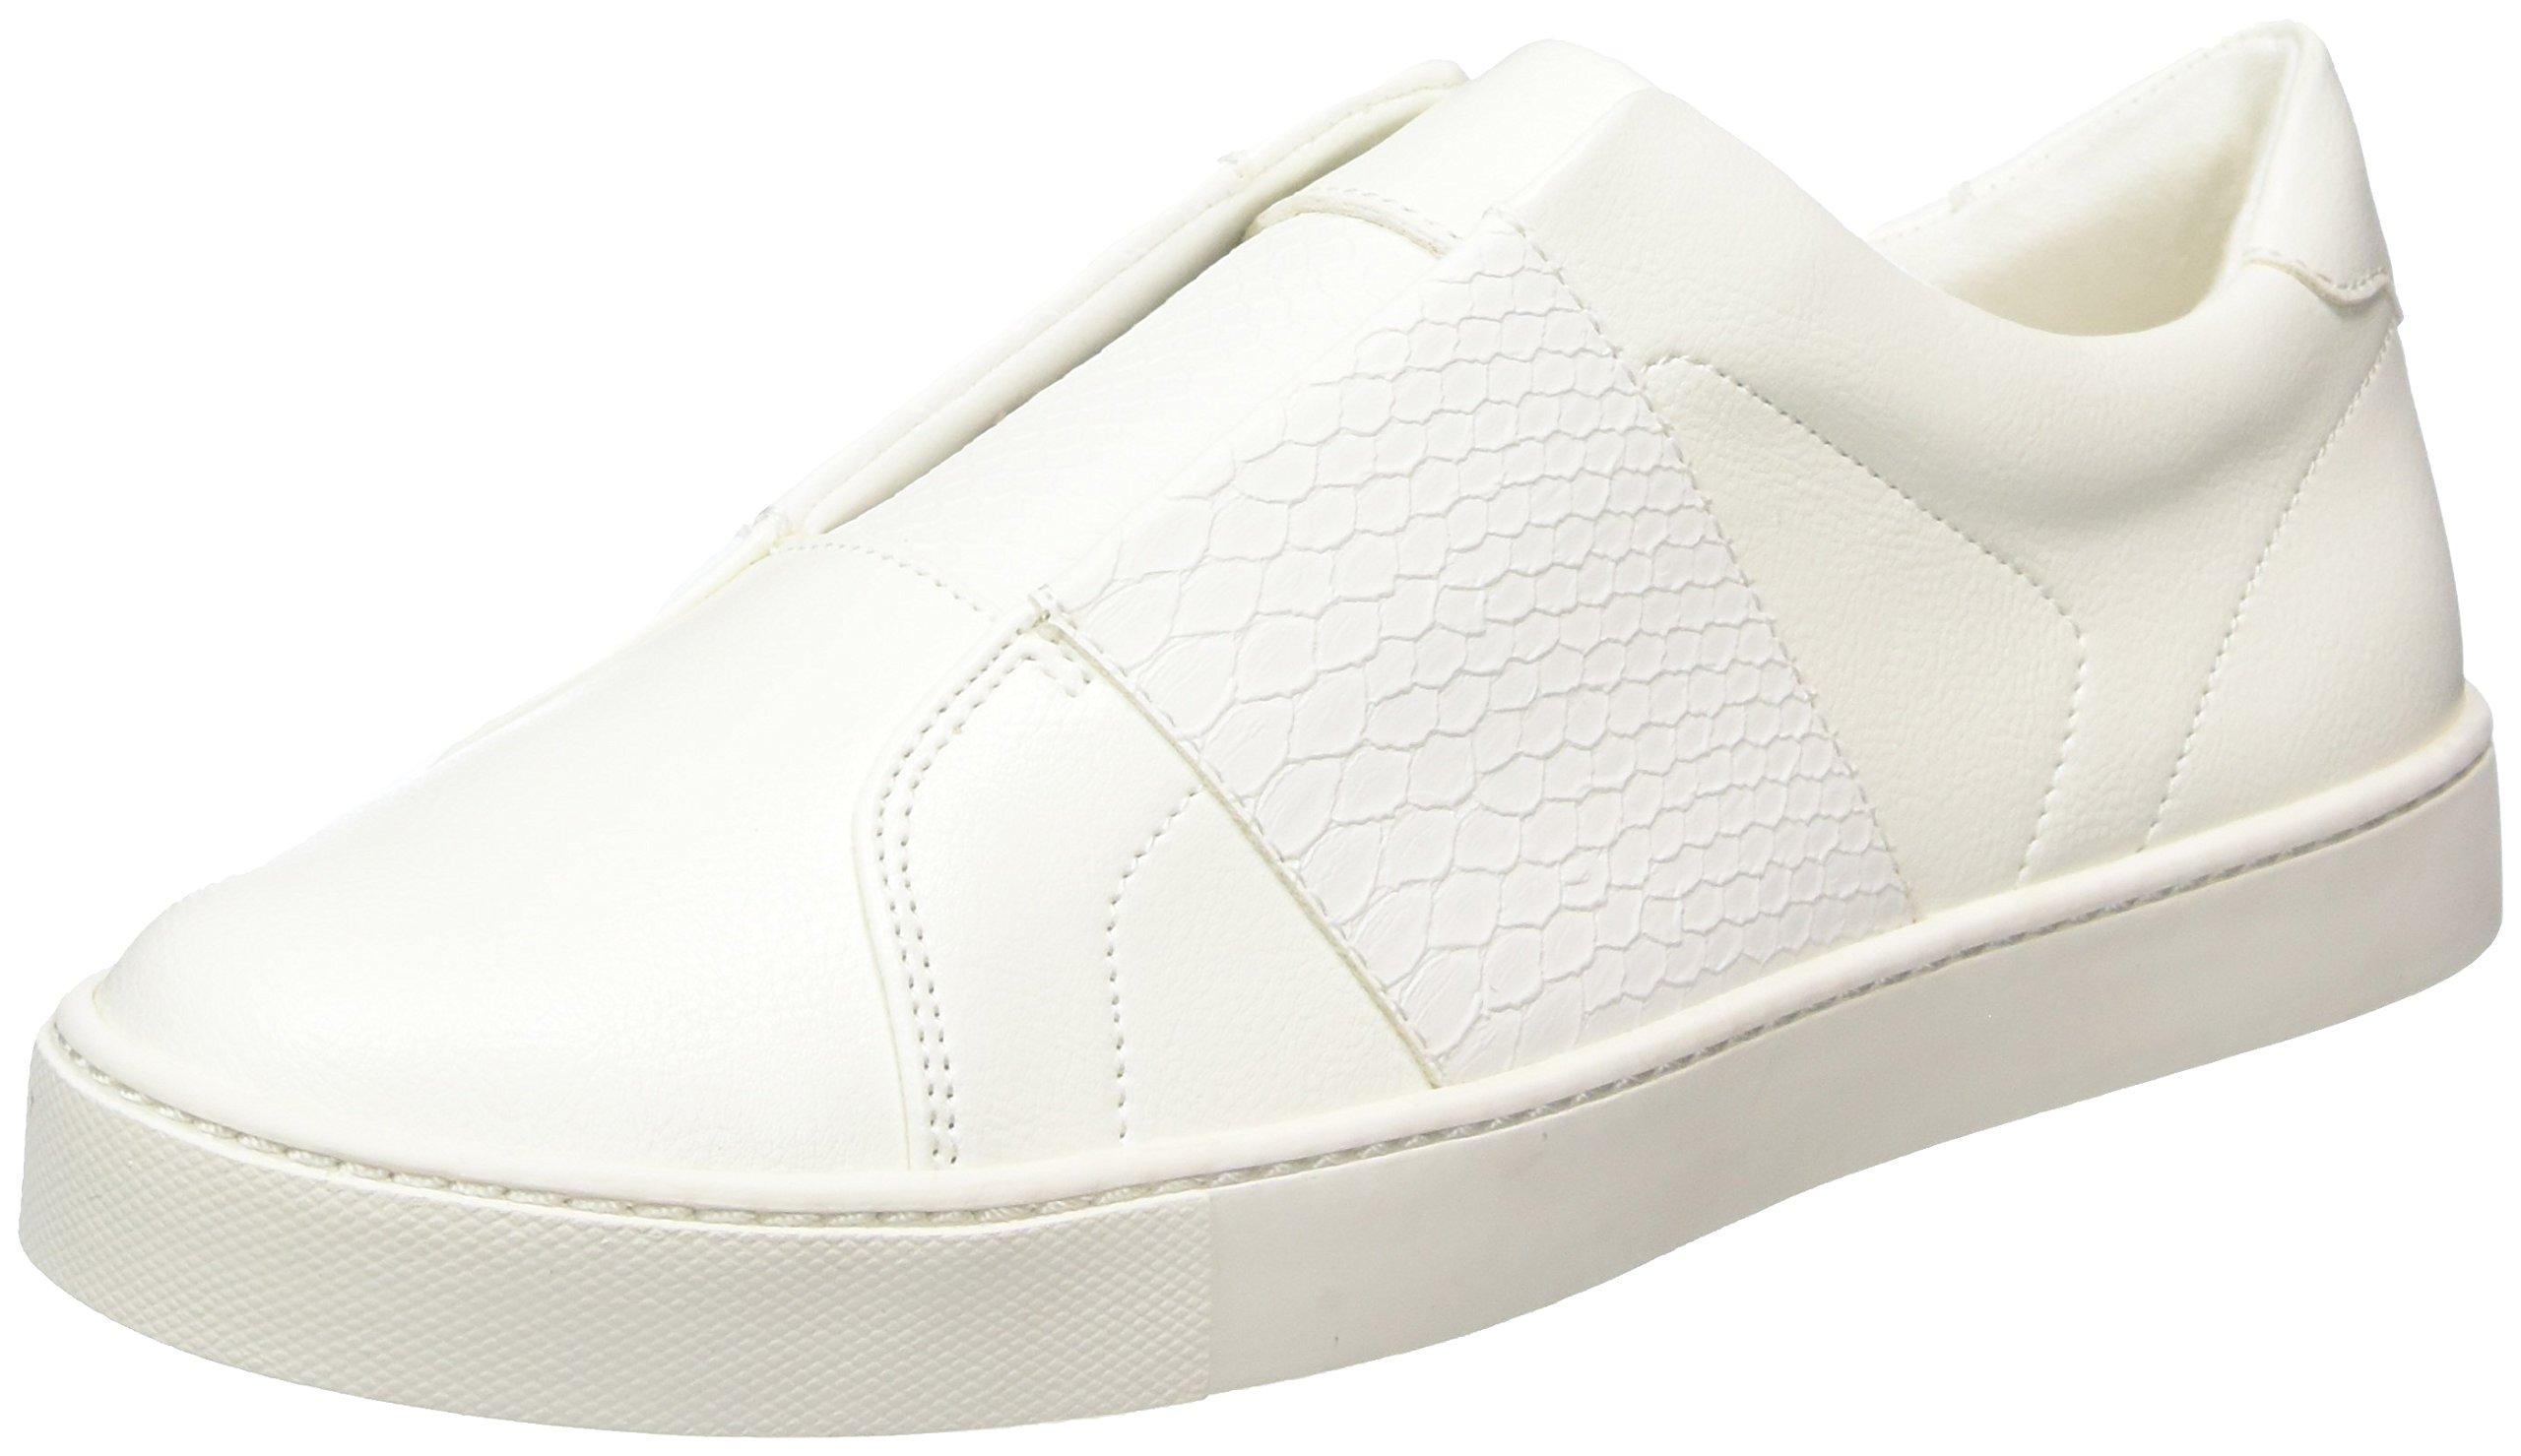 White39 PirasaSneakers Aldo FemmeBlanc70 Eu Basses 5cqjAR34L